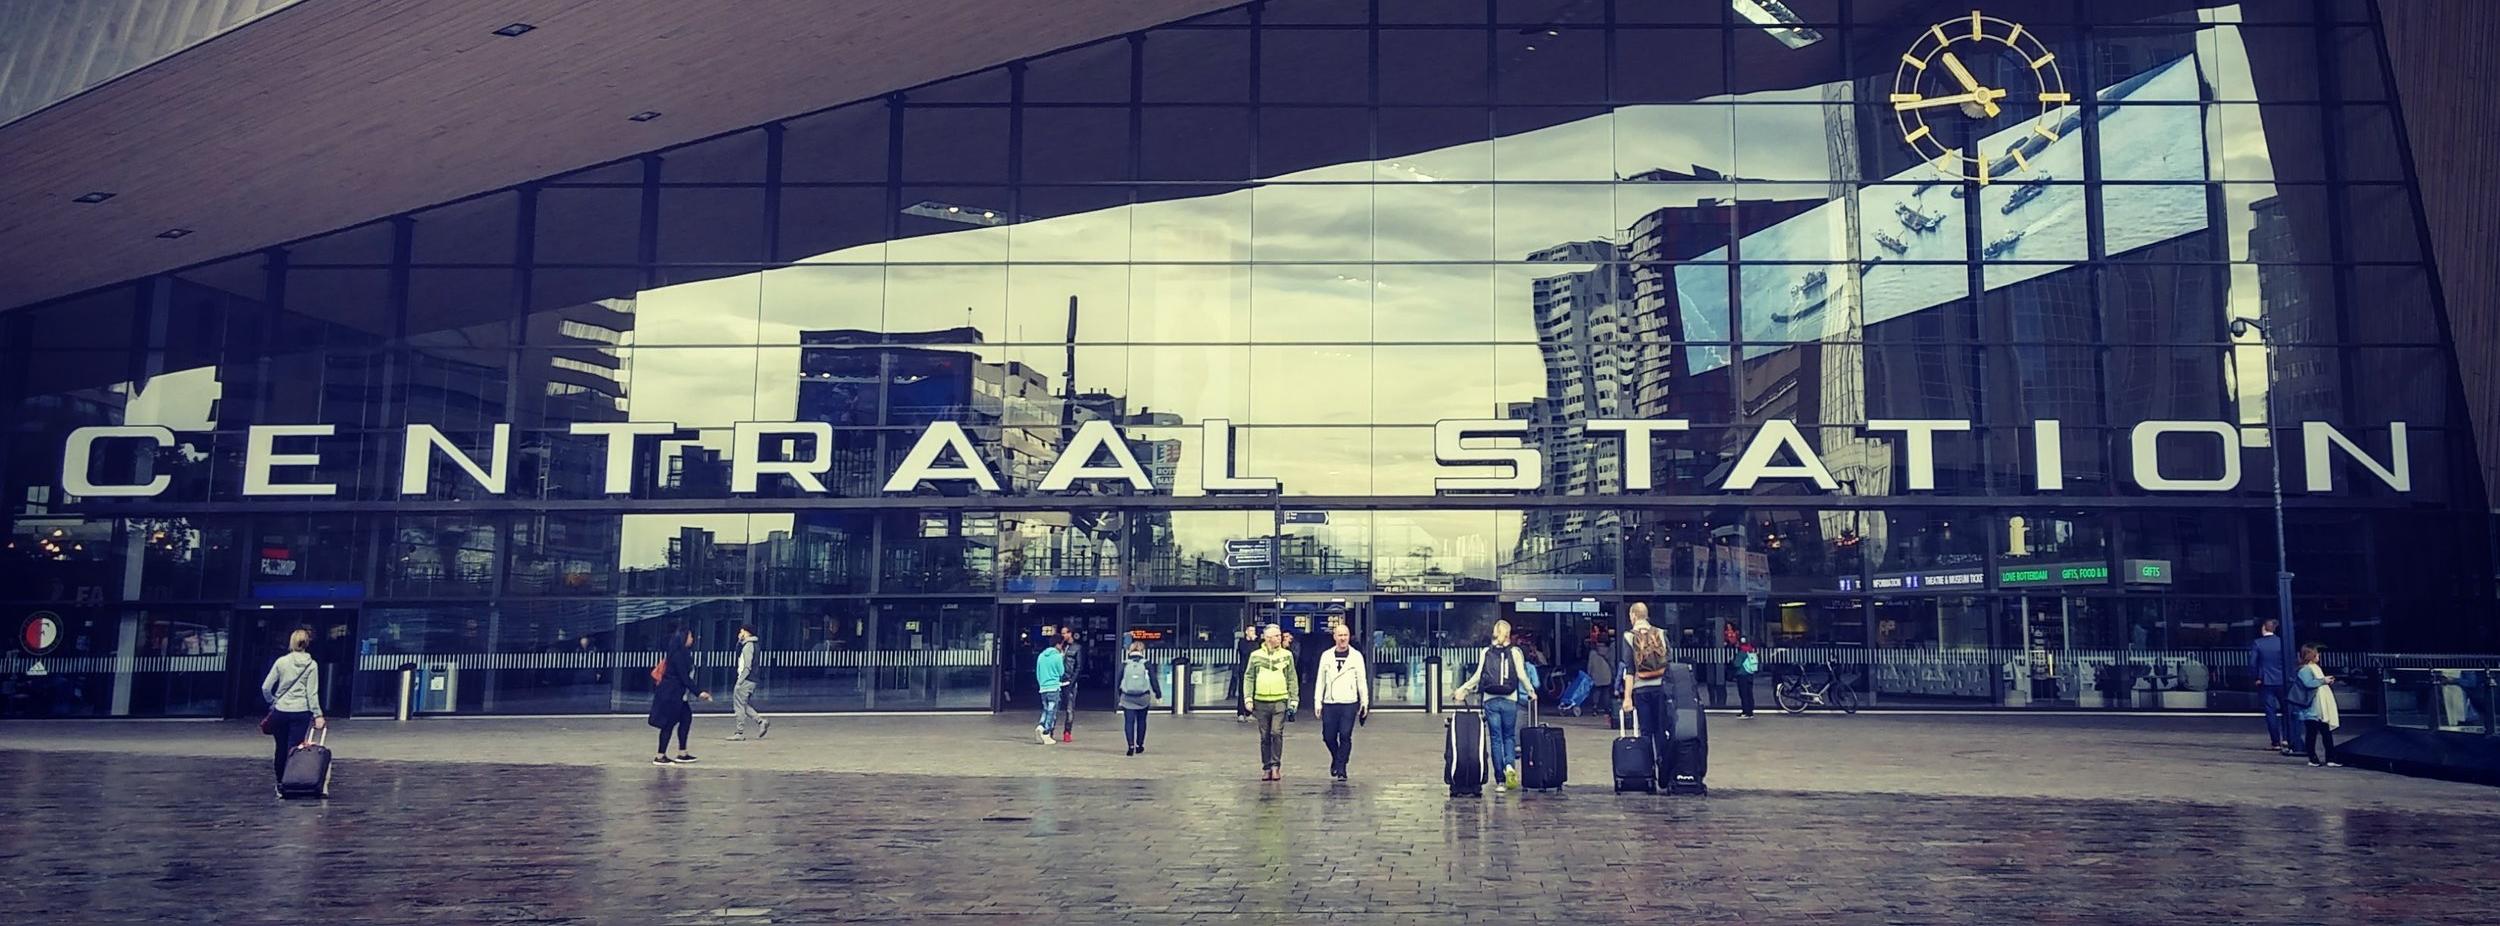 Centraal Train Station in Rotterdam Netherlands